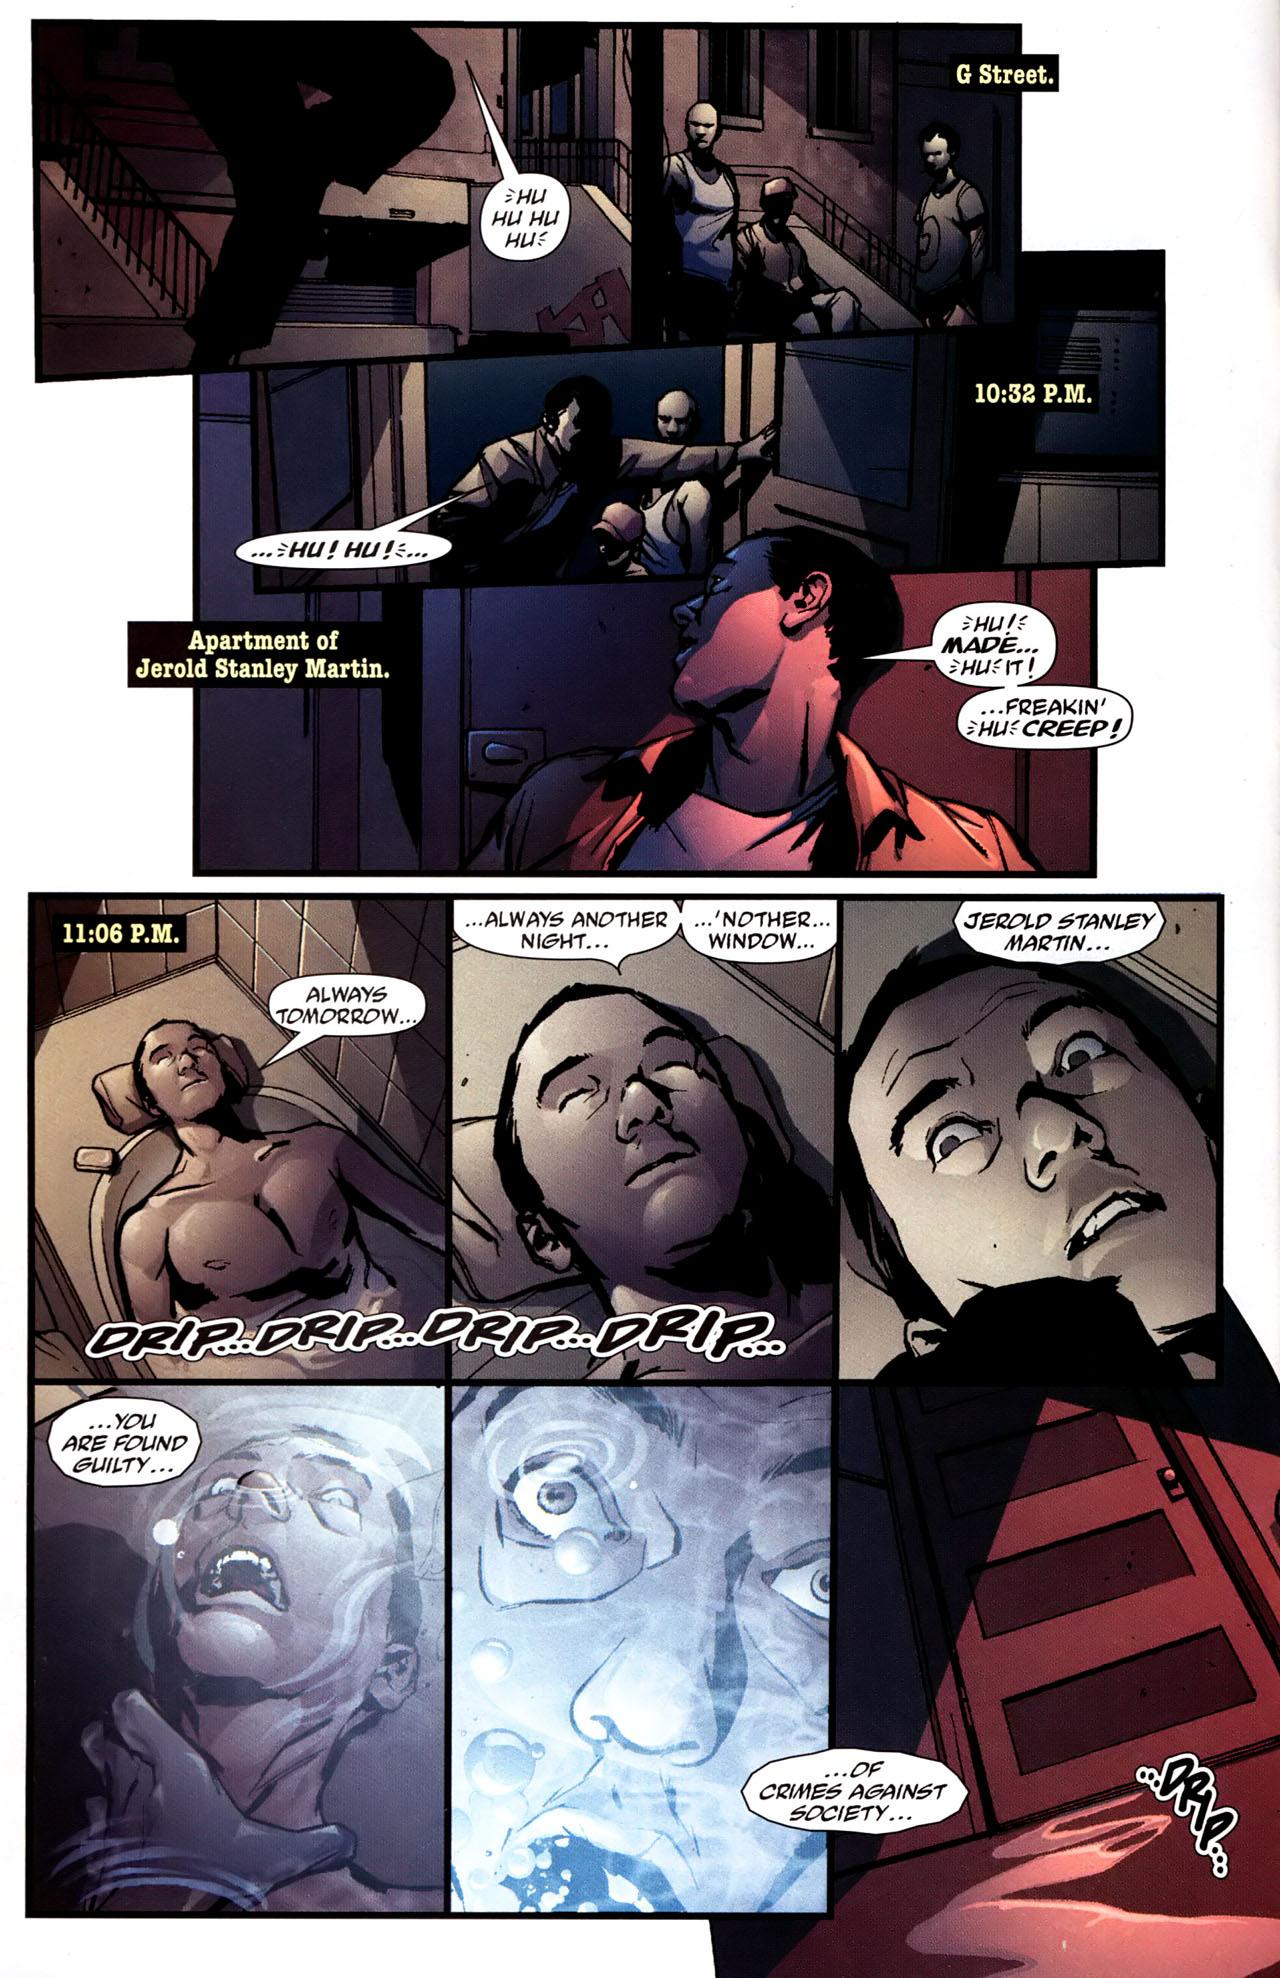 Vigilante (2005) #1 pg.06, lettered by Clem Robins.